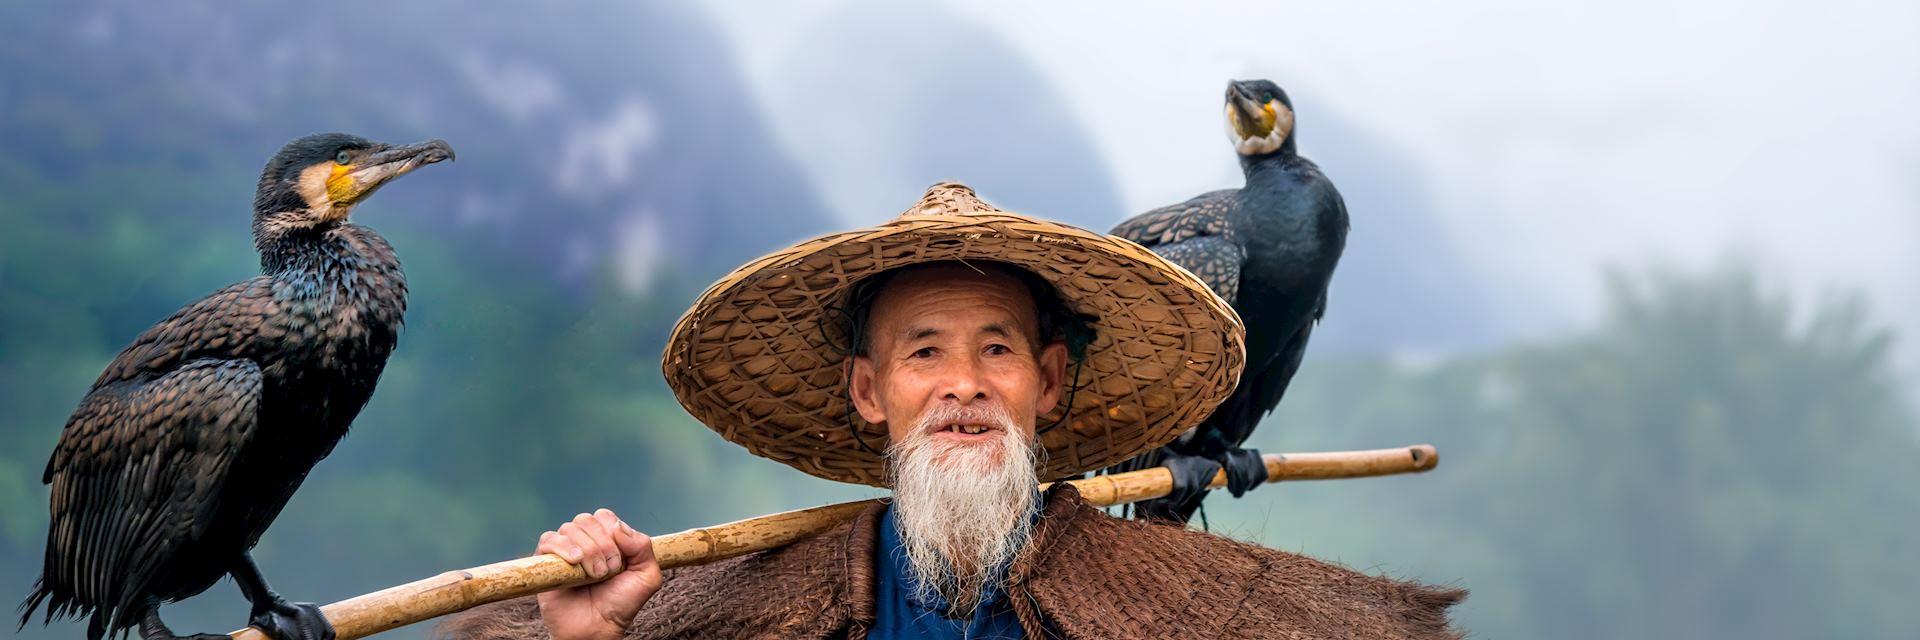 Fisherman with cormorants on the Li River